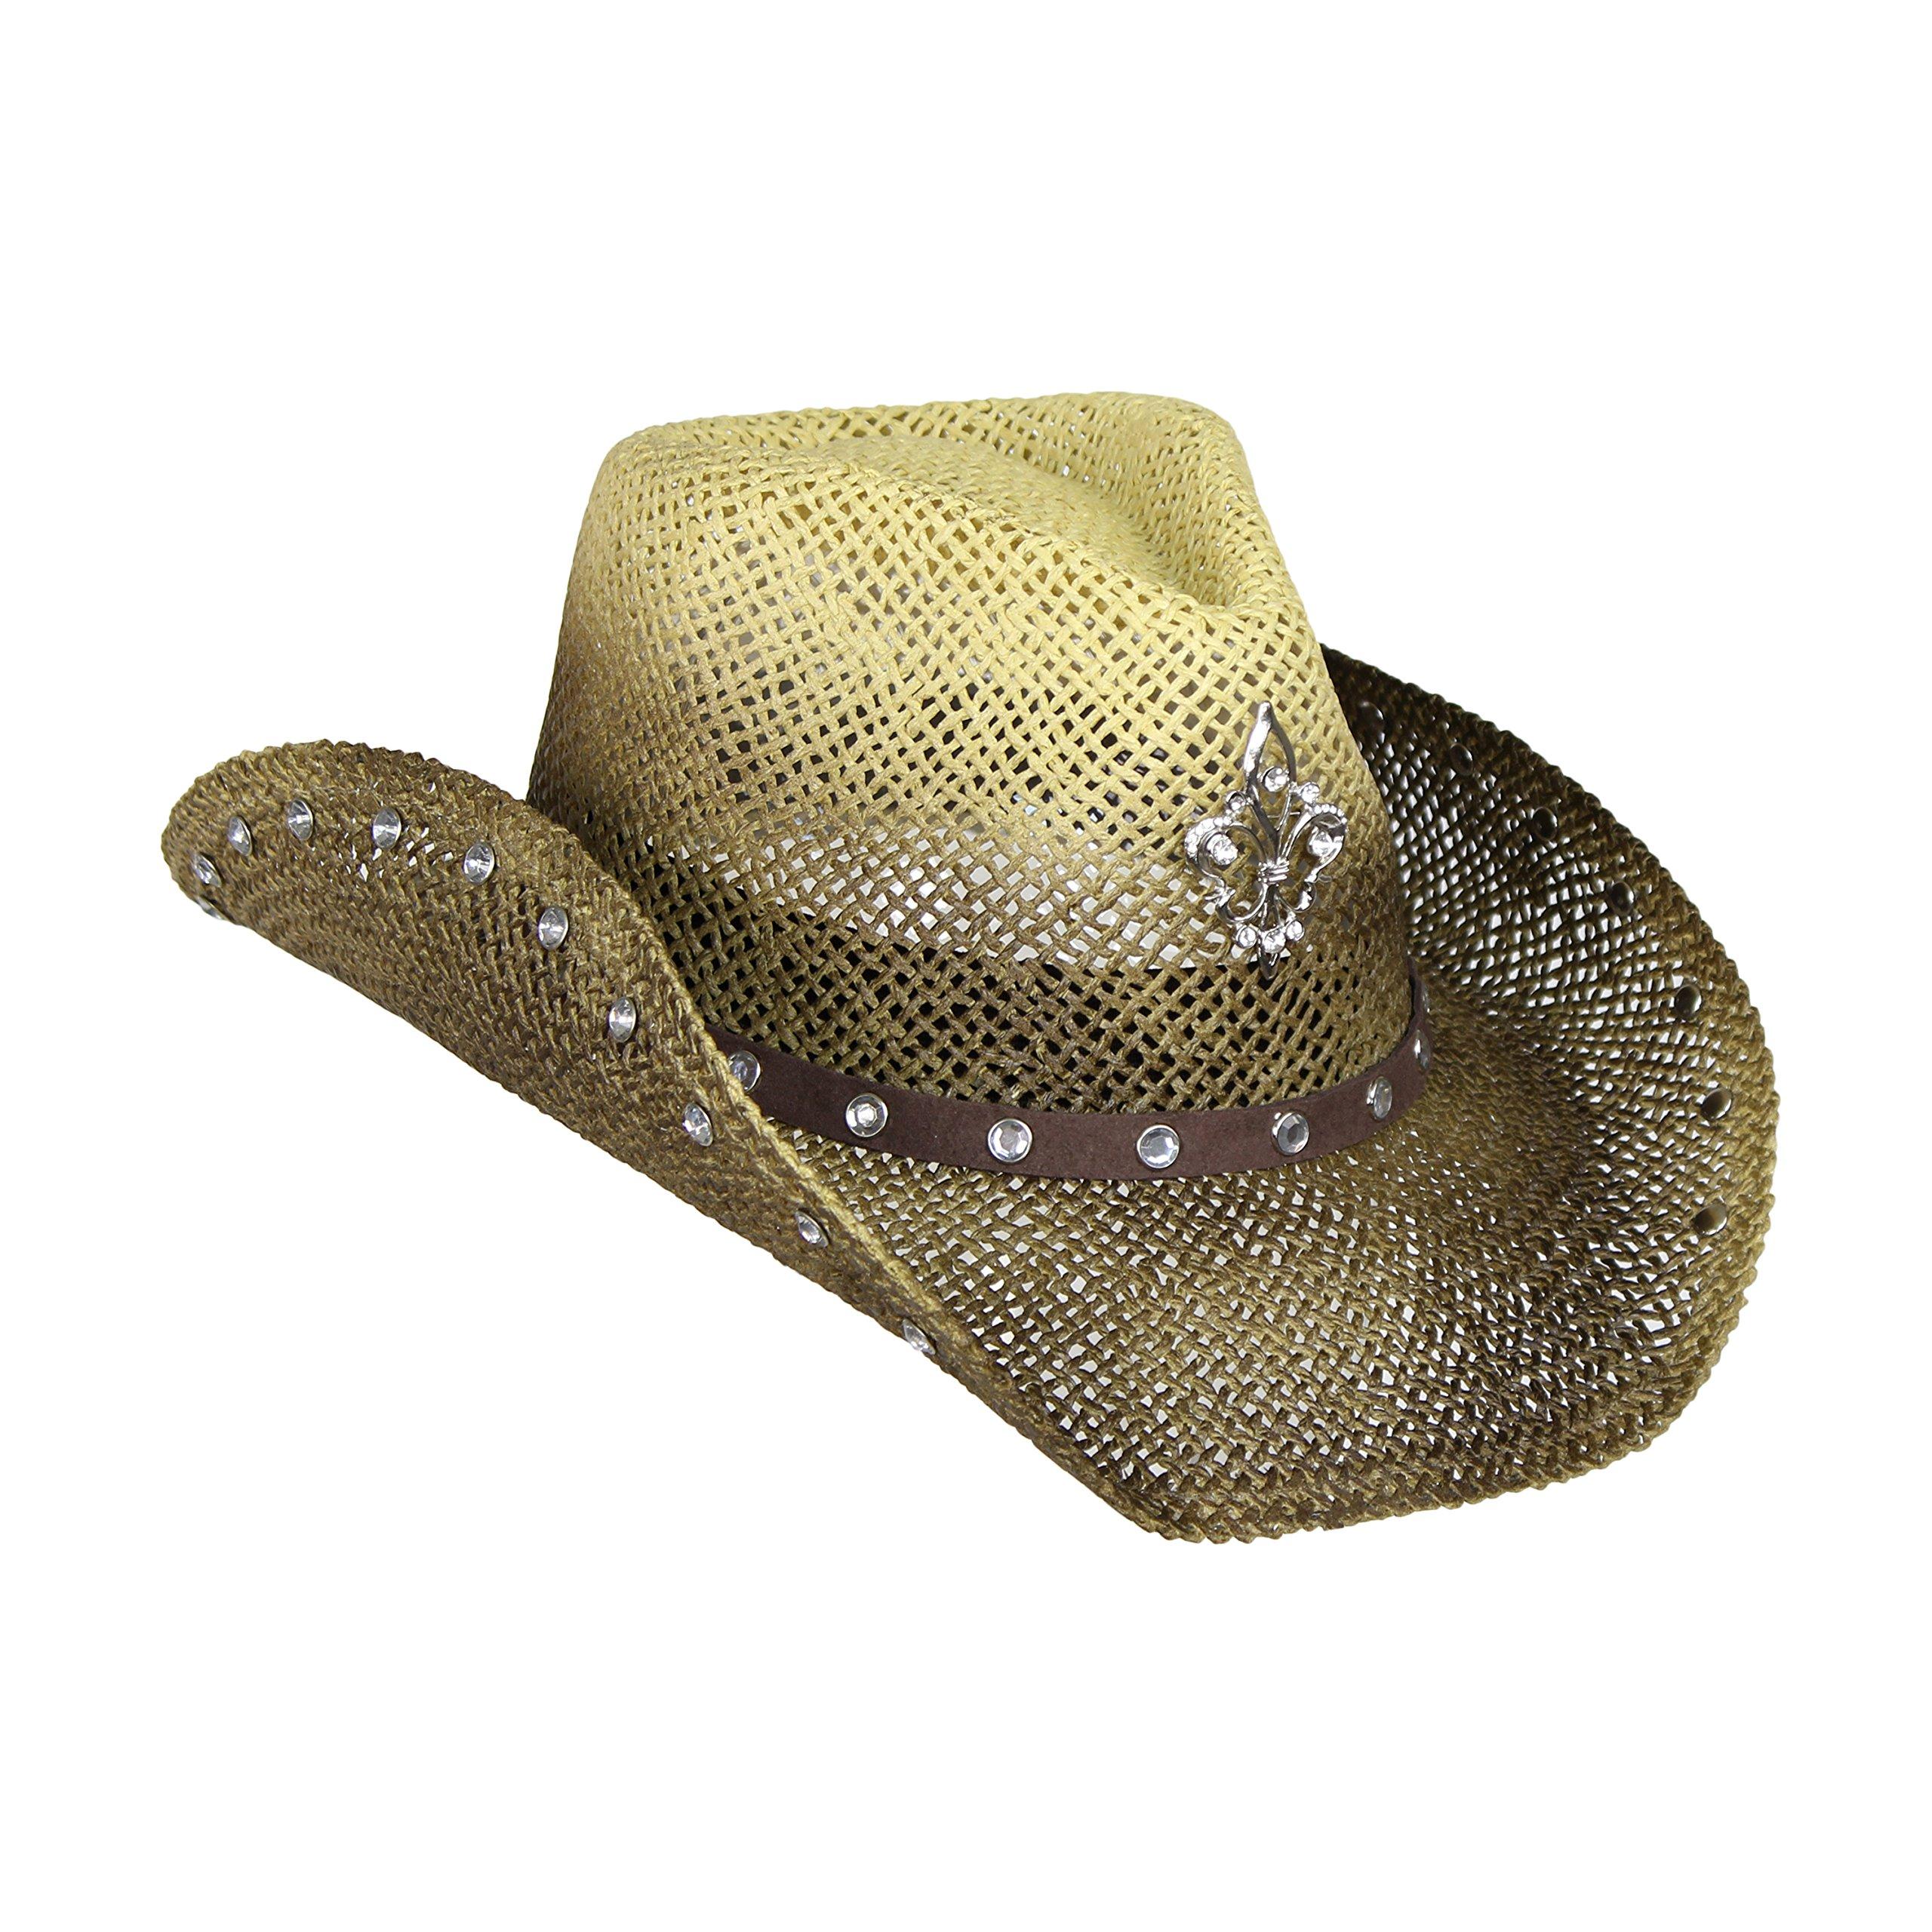 Western Khaki & Brown Ombre Cowboy Hat, Straw Cowgirl Hat with Rhinestones & Broach